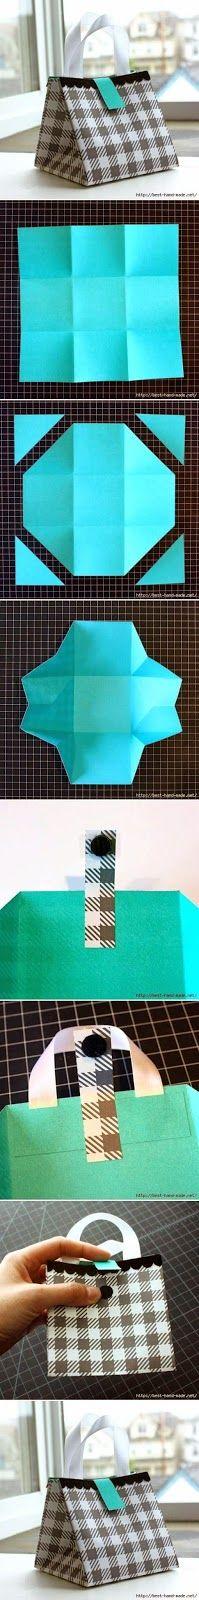 Kerajinan Tangan Dari Kertas Craft Kertas Bekas Kerajinan